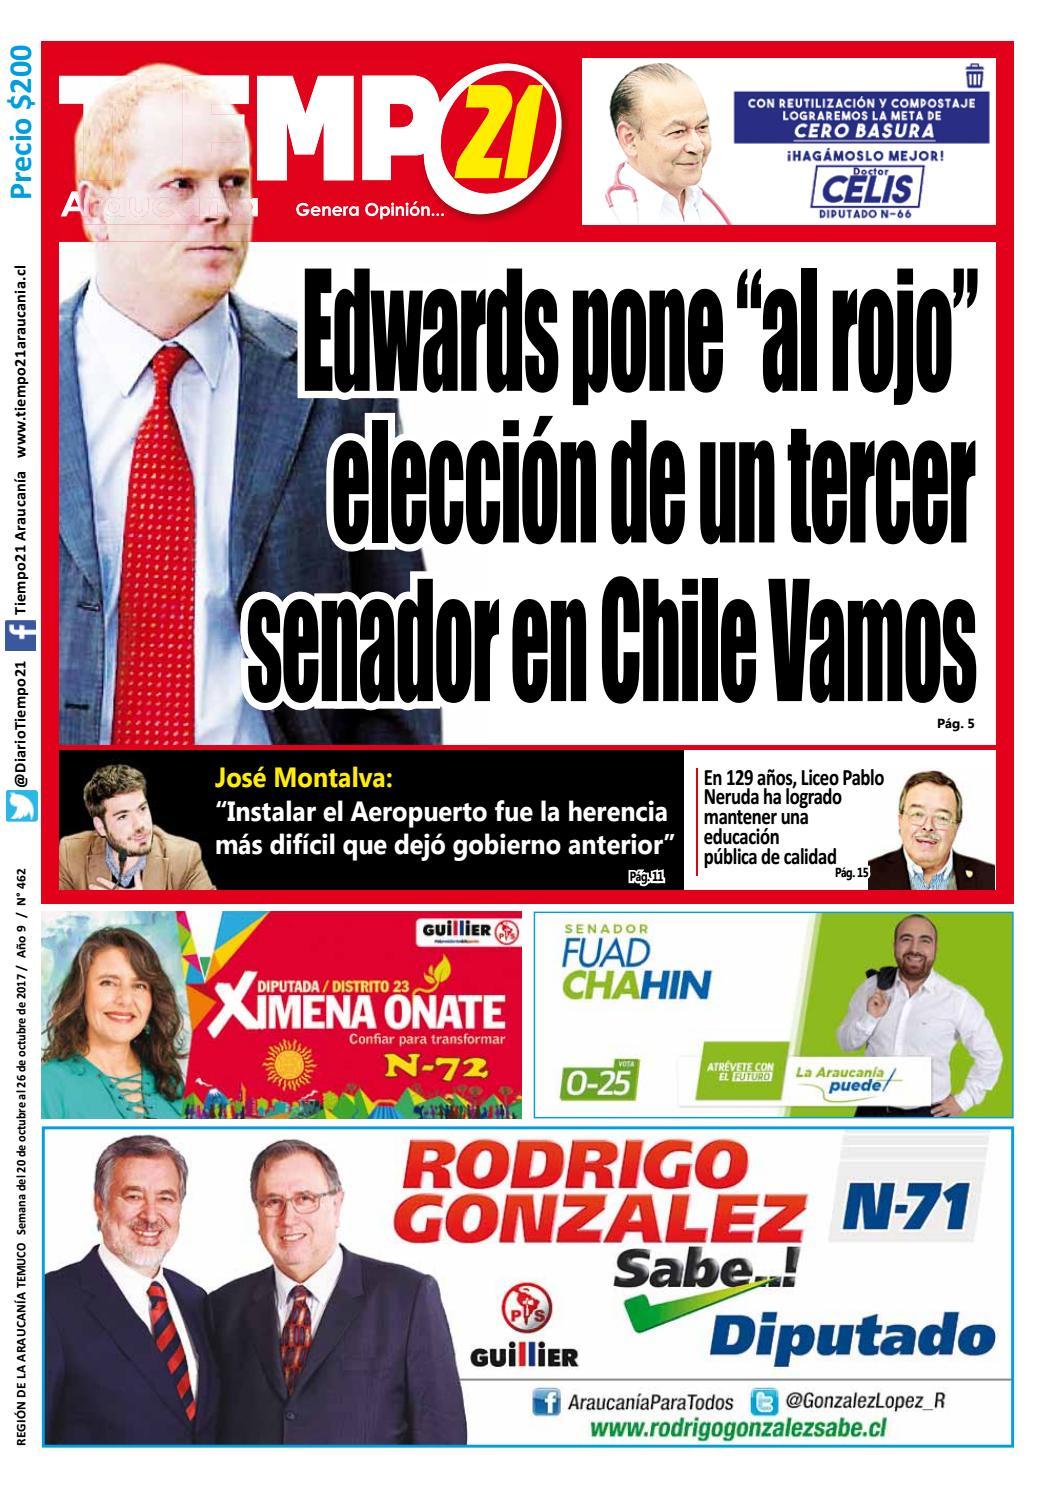 Muebles Nahuel Angol - Edici N 462 Edwards Pone Al Rojo Elecci N De Un Tercer Senador [mjhdah]https://image.isu.pub/160311102409-743bc9c55aaed346012bfb1c60fcc174/jpg/page_1.jpg